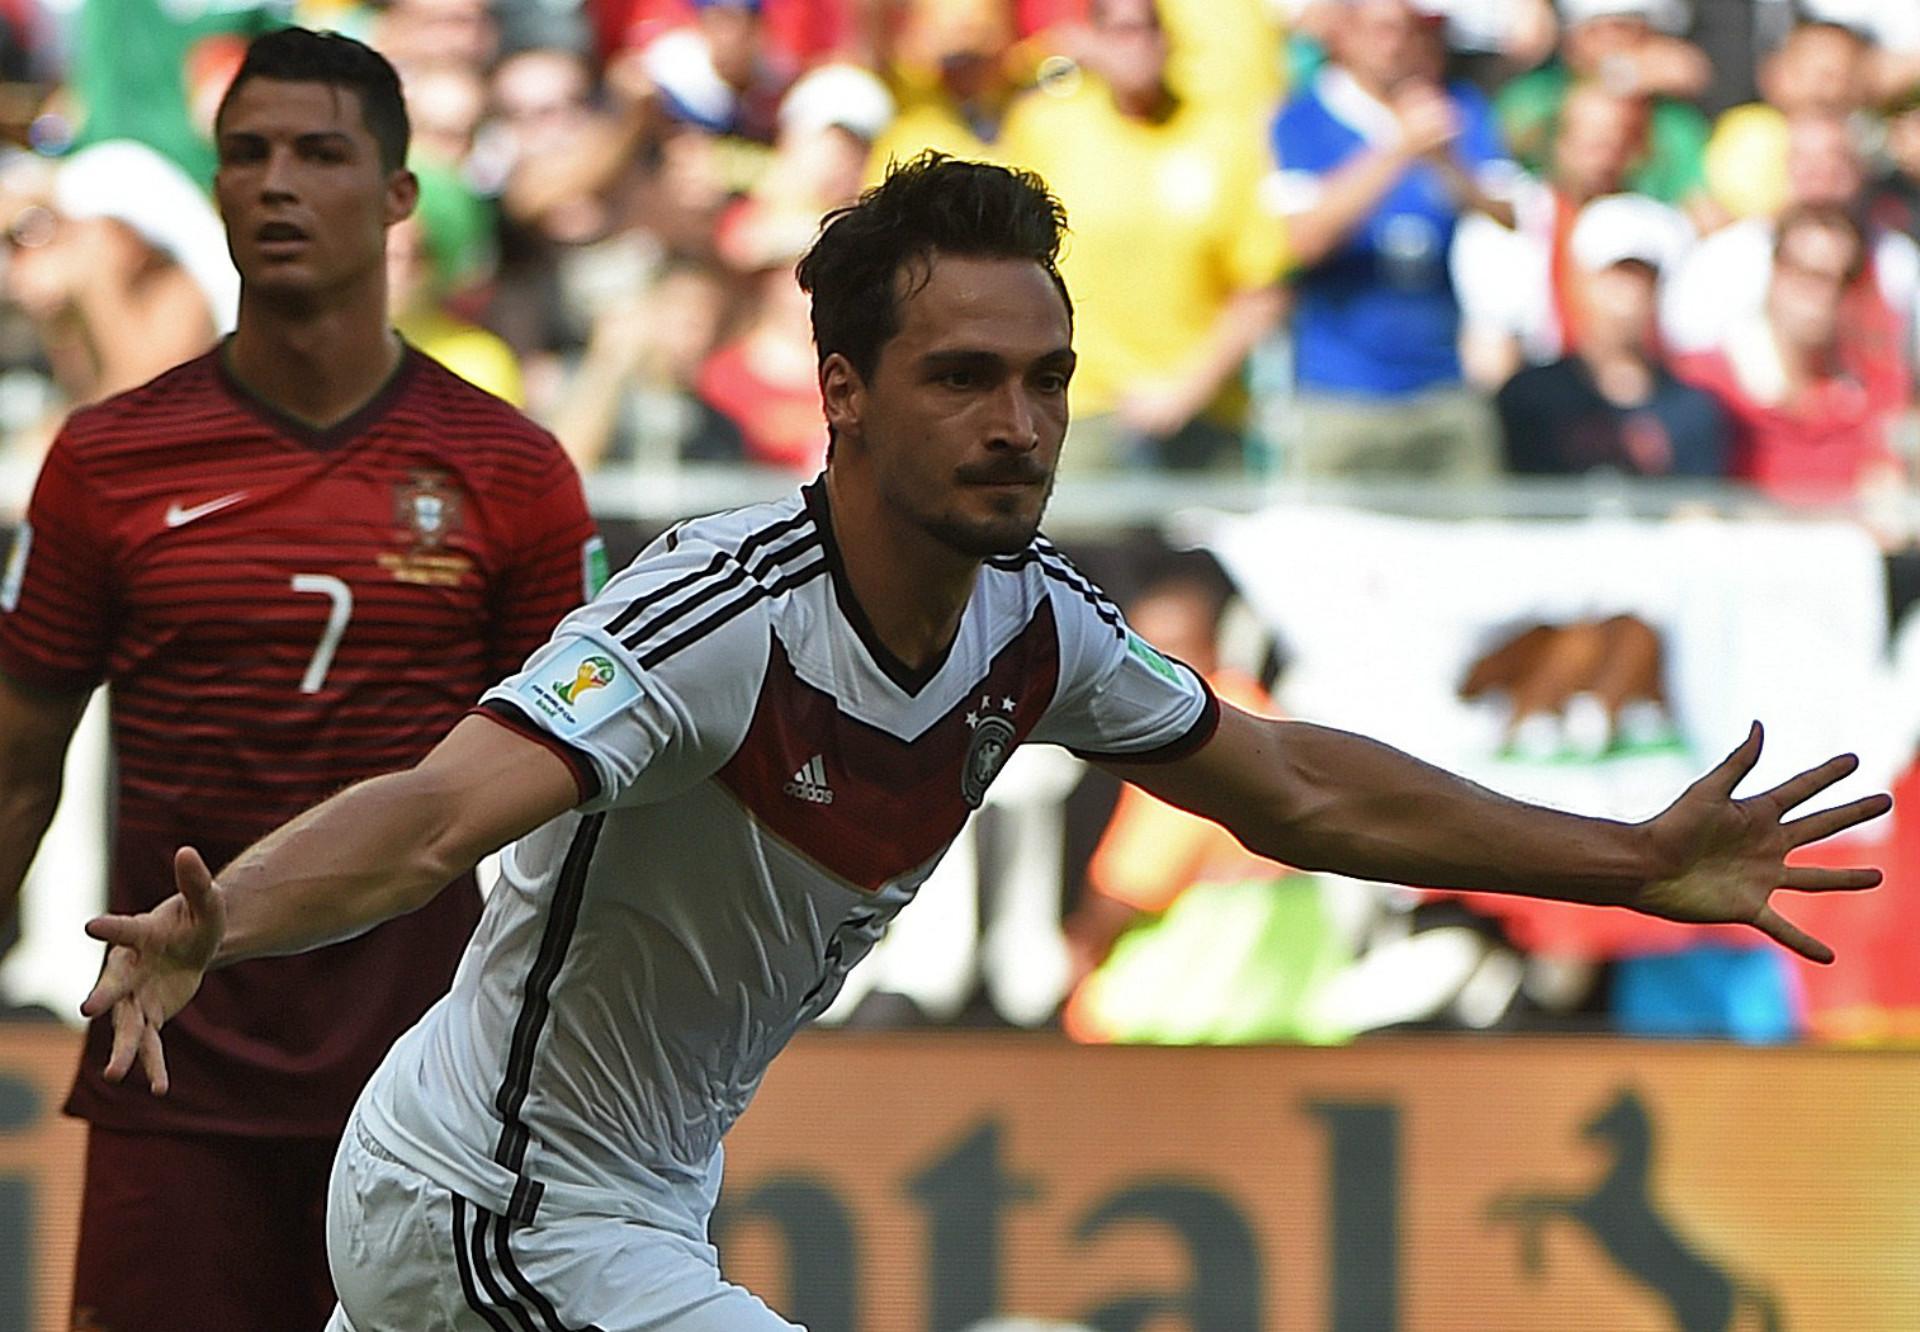 CRISTIANO RONALDO PORTUGAL MATS HUMMELS GERMANY 2014 WORLD CUP GROUP G 06162014